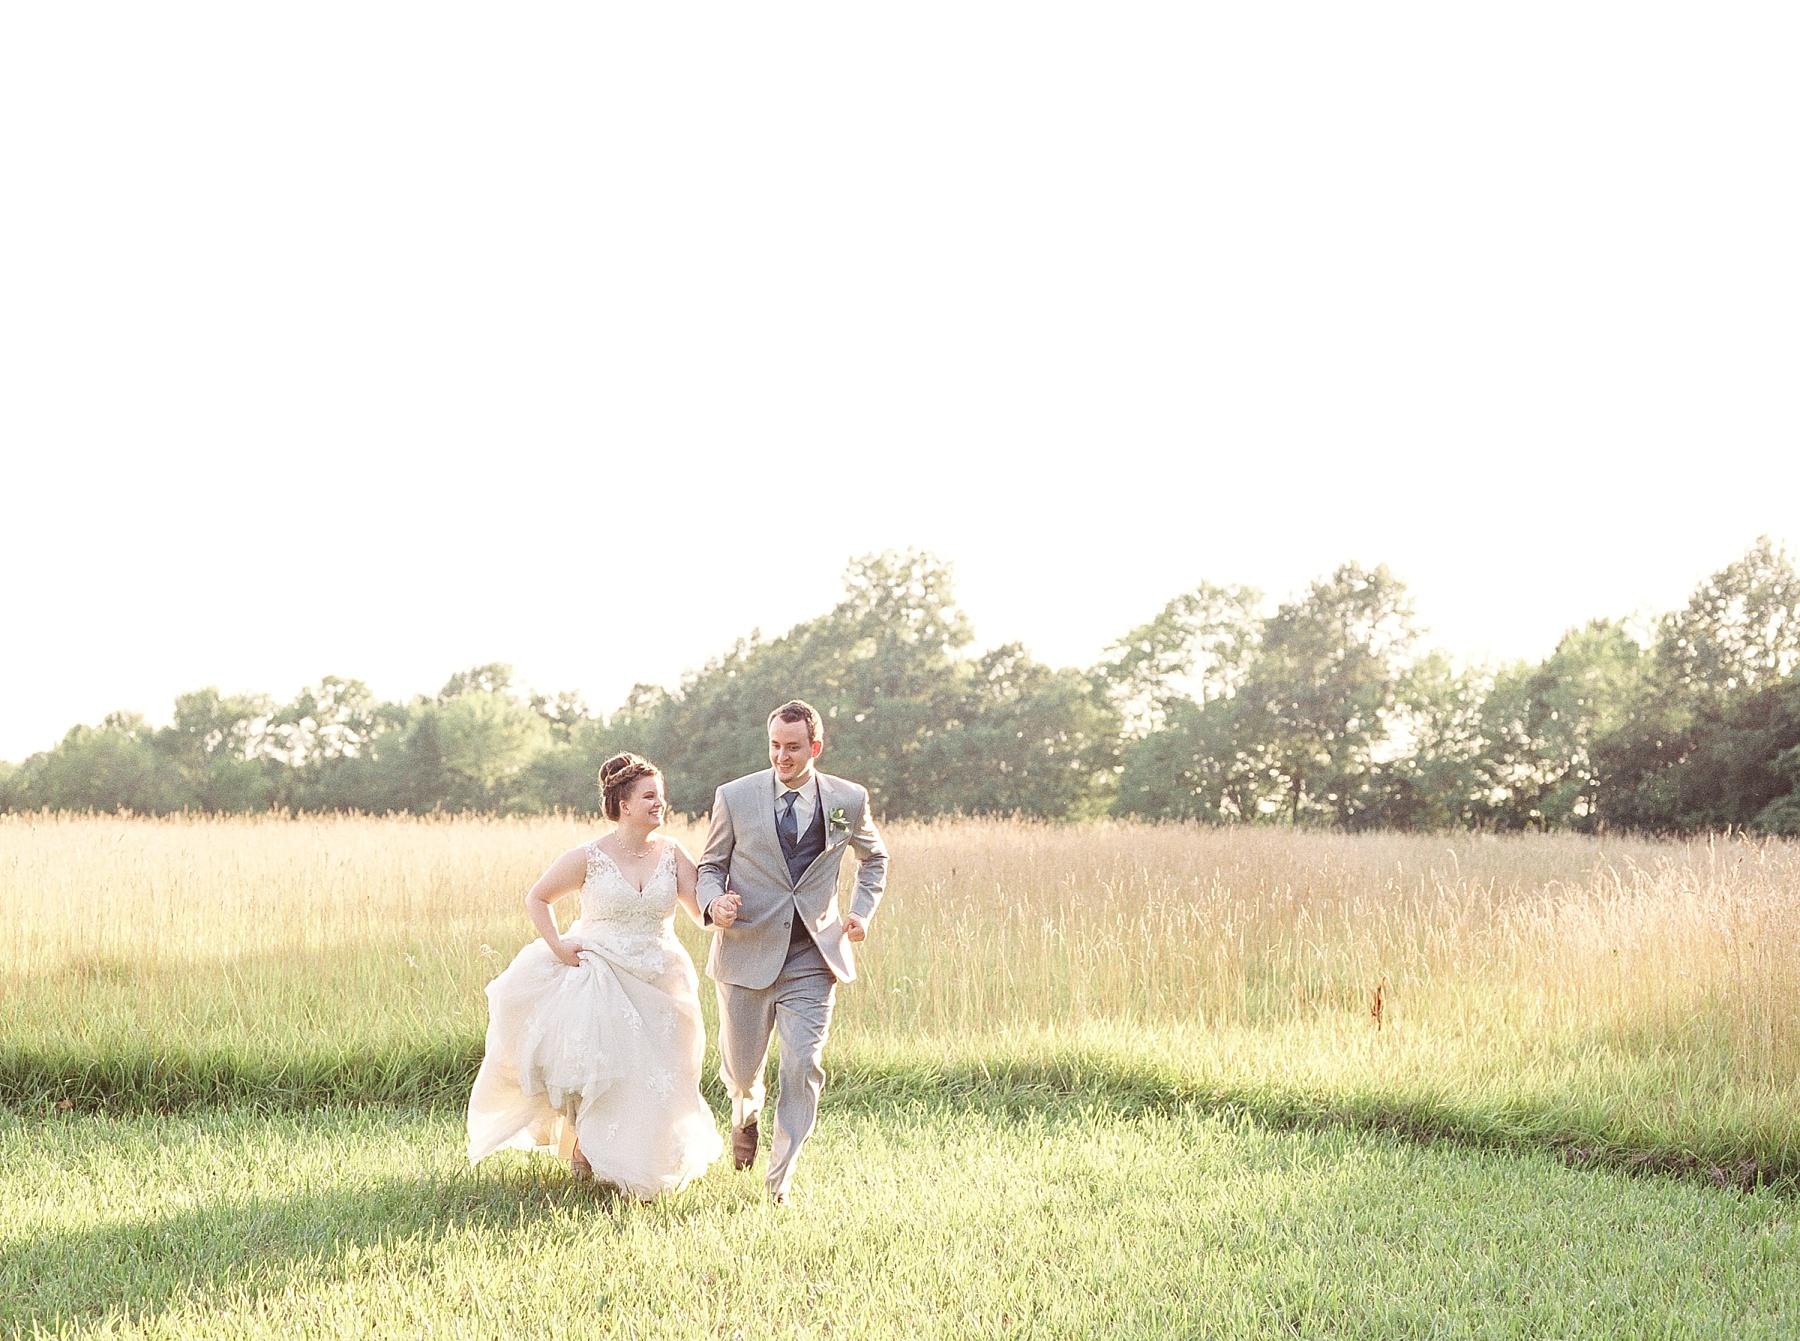 Intimate Summer Wedding at Emerson Fields by Kelsi Kliethermes Photography Best Missouri and Maui Wedding Photographer_0023.jpg